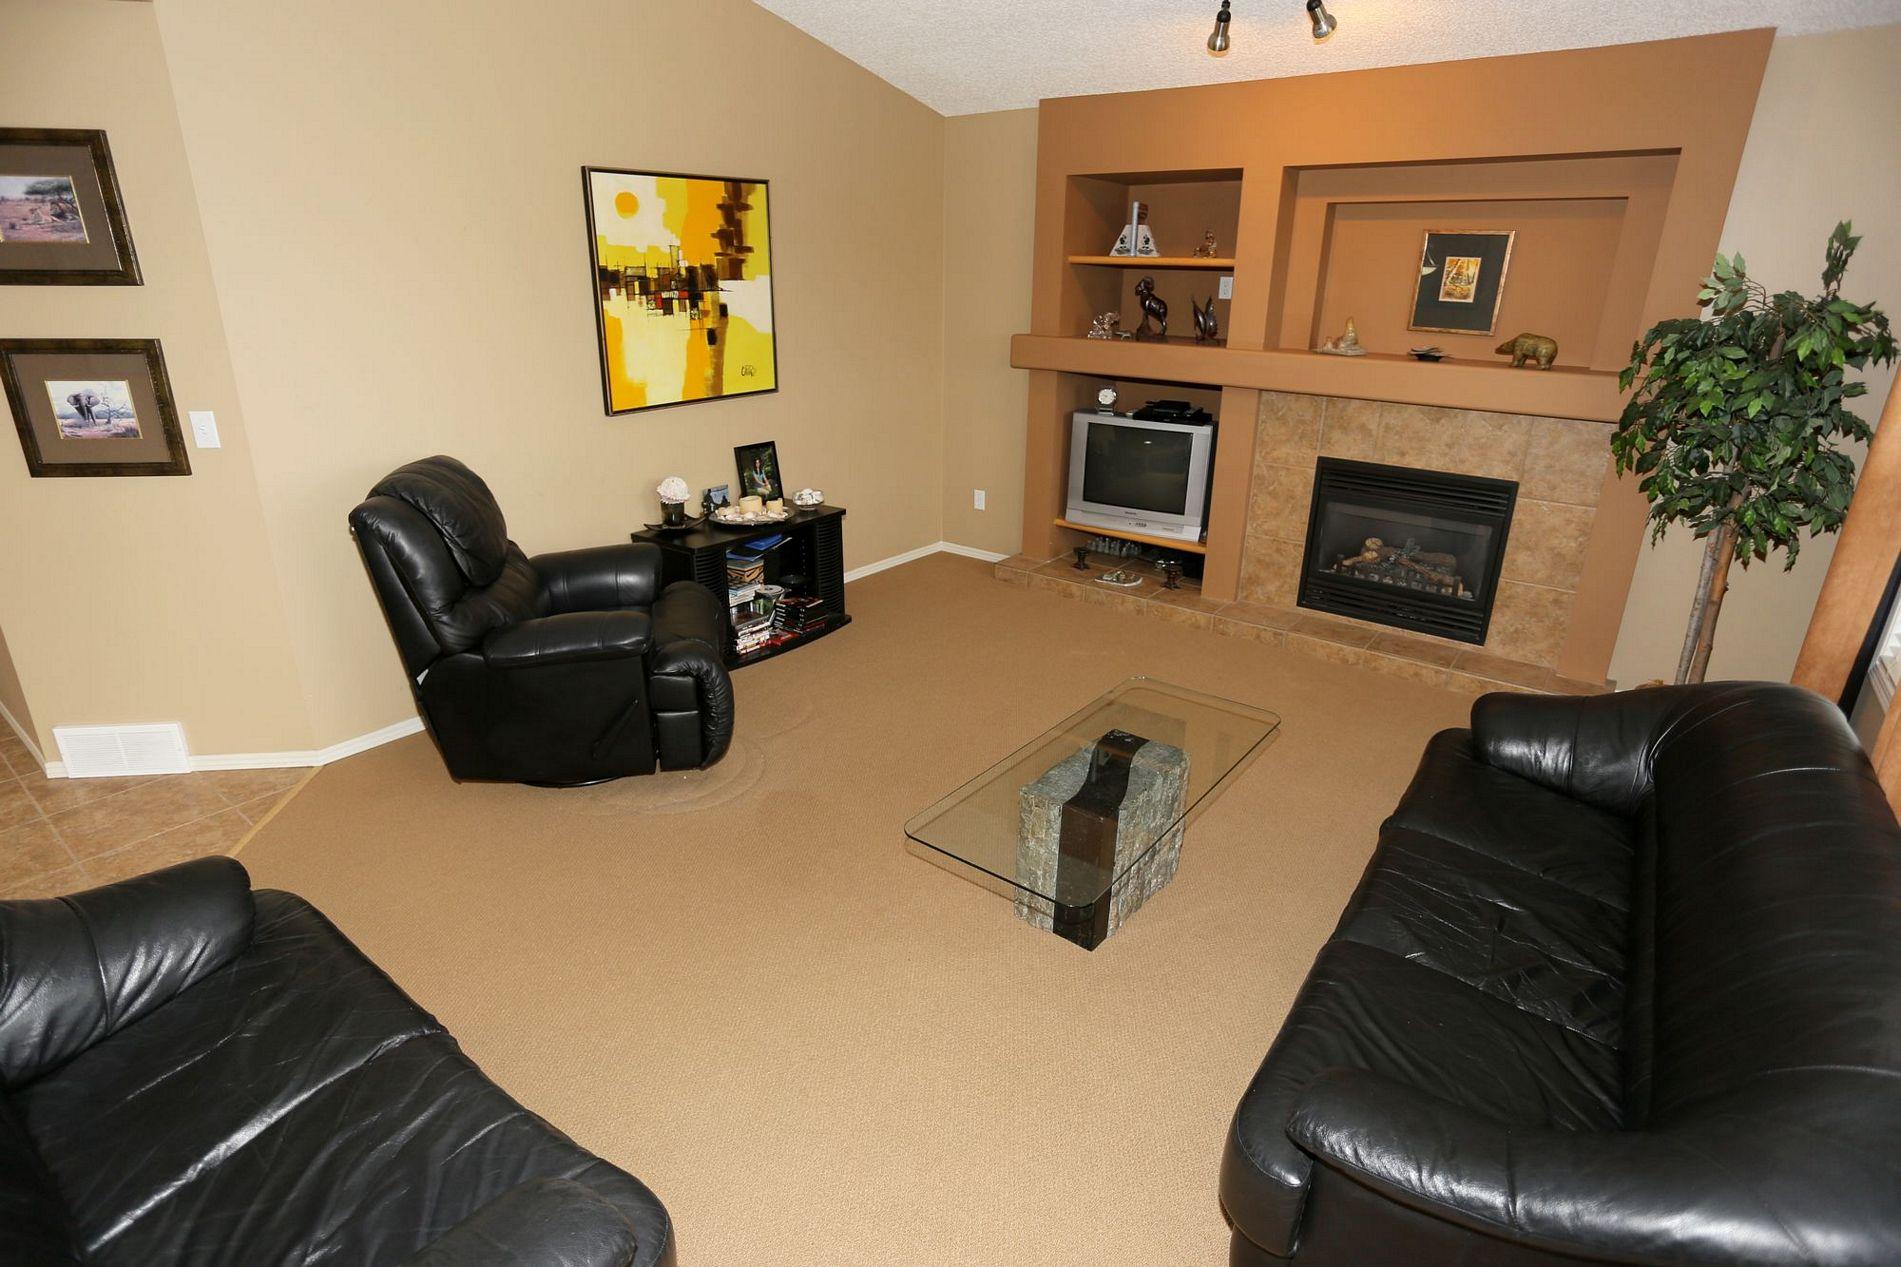 15 Nordstrom Drive, Winnipeg, Manitoba  R3X 0A5 - Photo 5 - 1524618